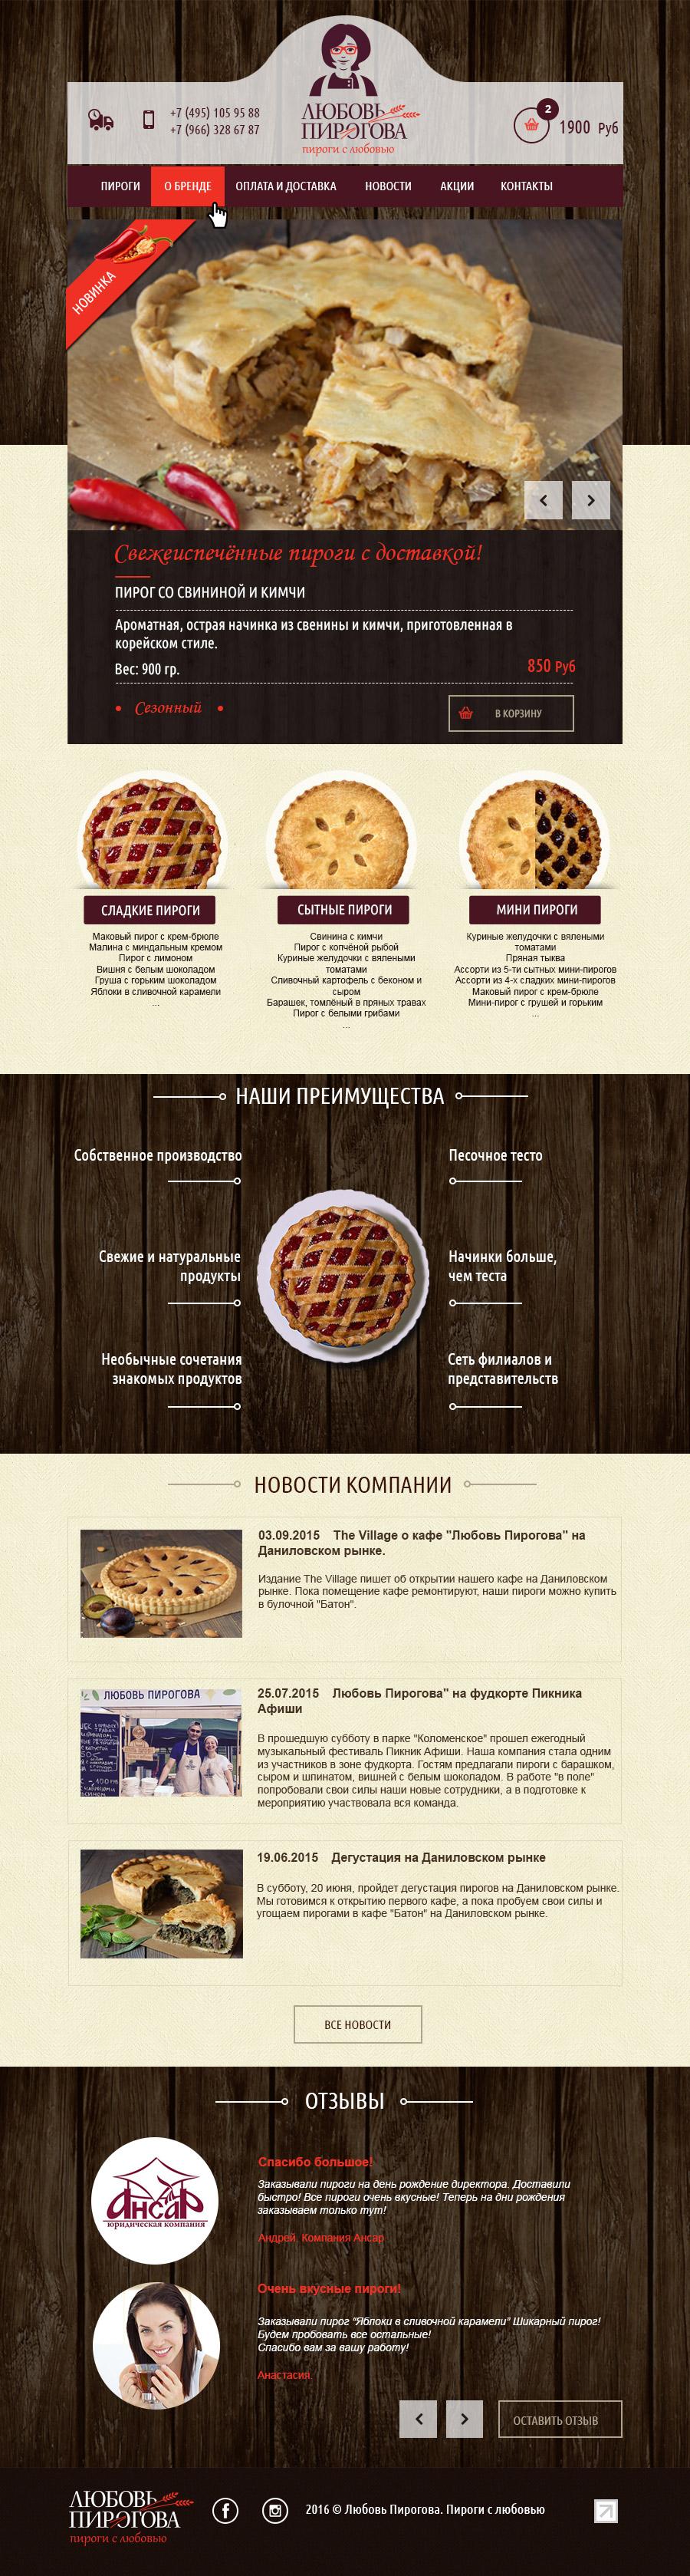 Разработка дизайна сайта lovepirogova.ru фото f_89456b7287db55c8.jpg